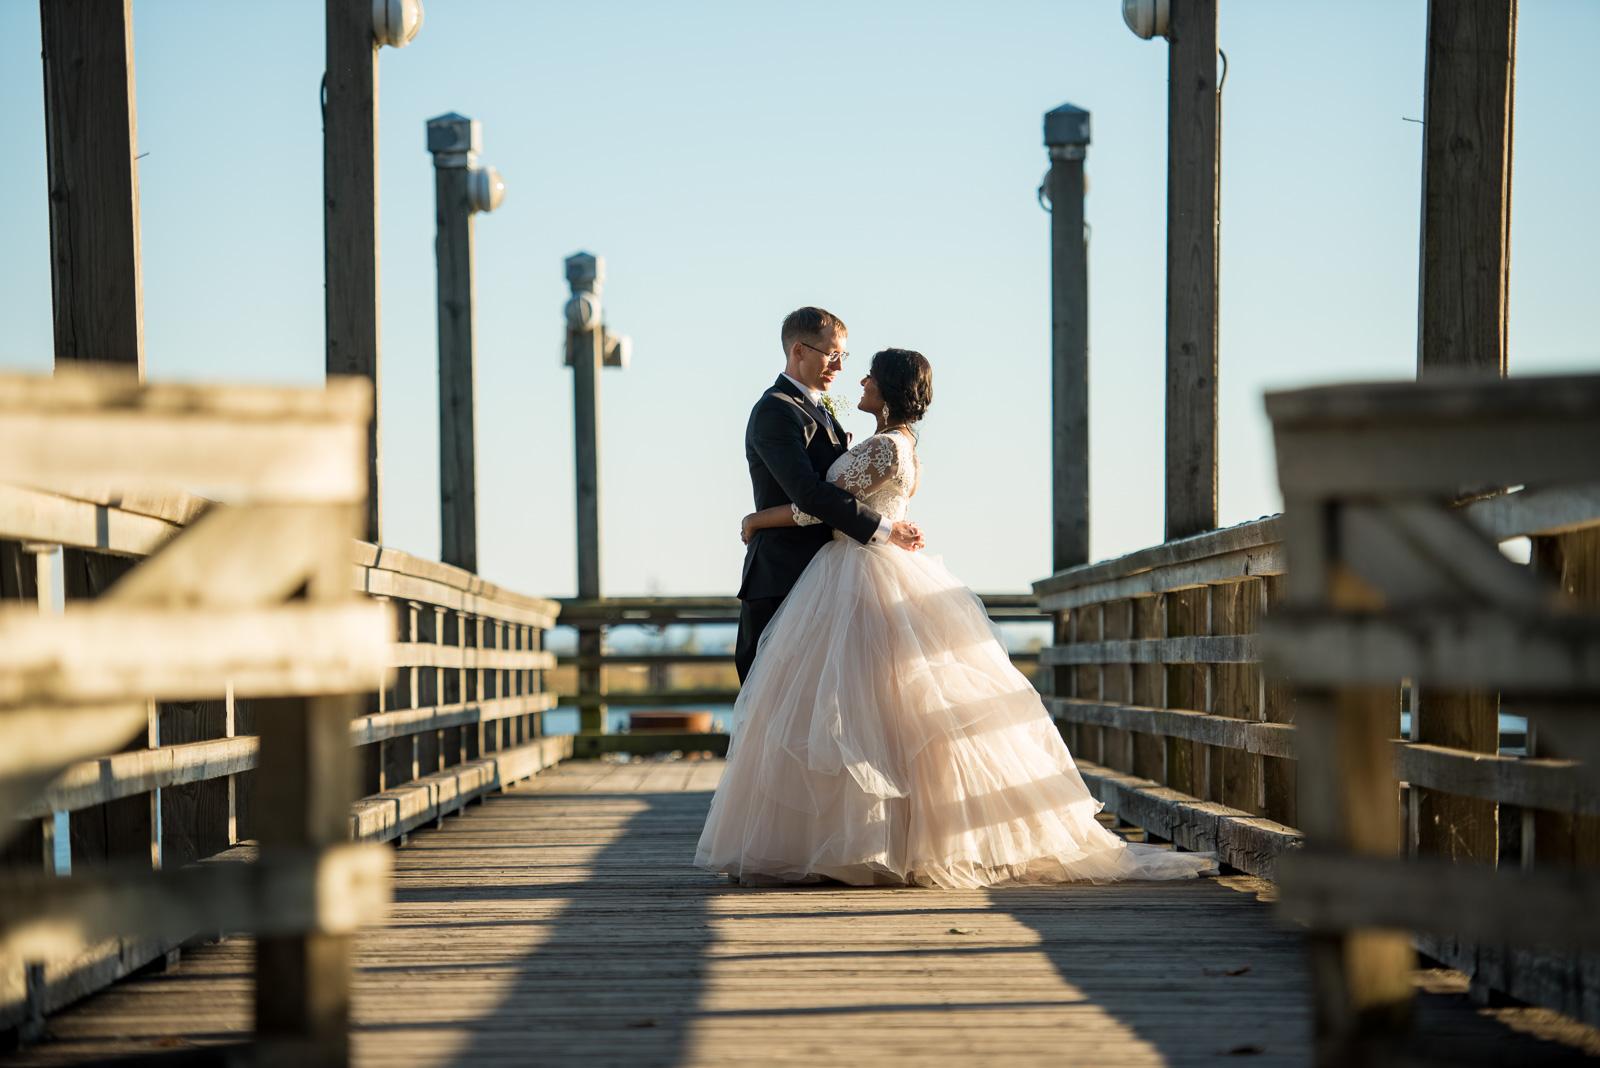 bc-wedding-photographers-paradise-banquet-hall-wedding-26.jpg